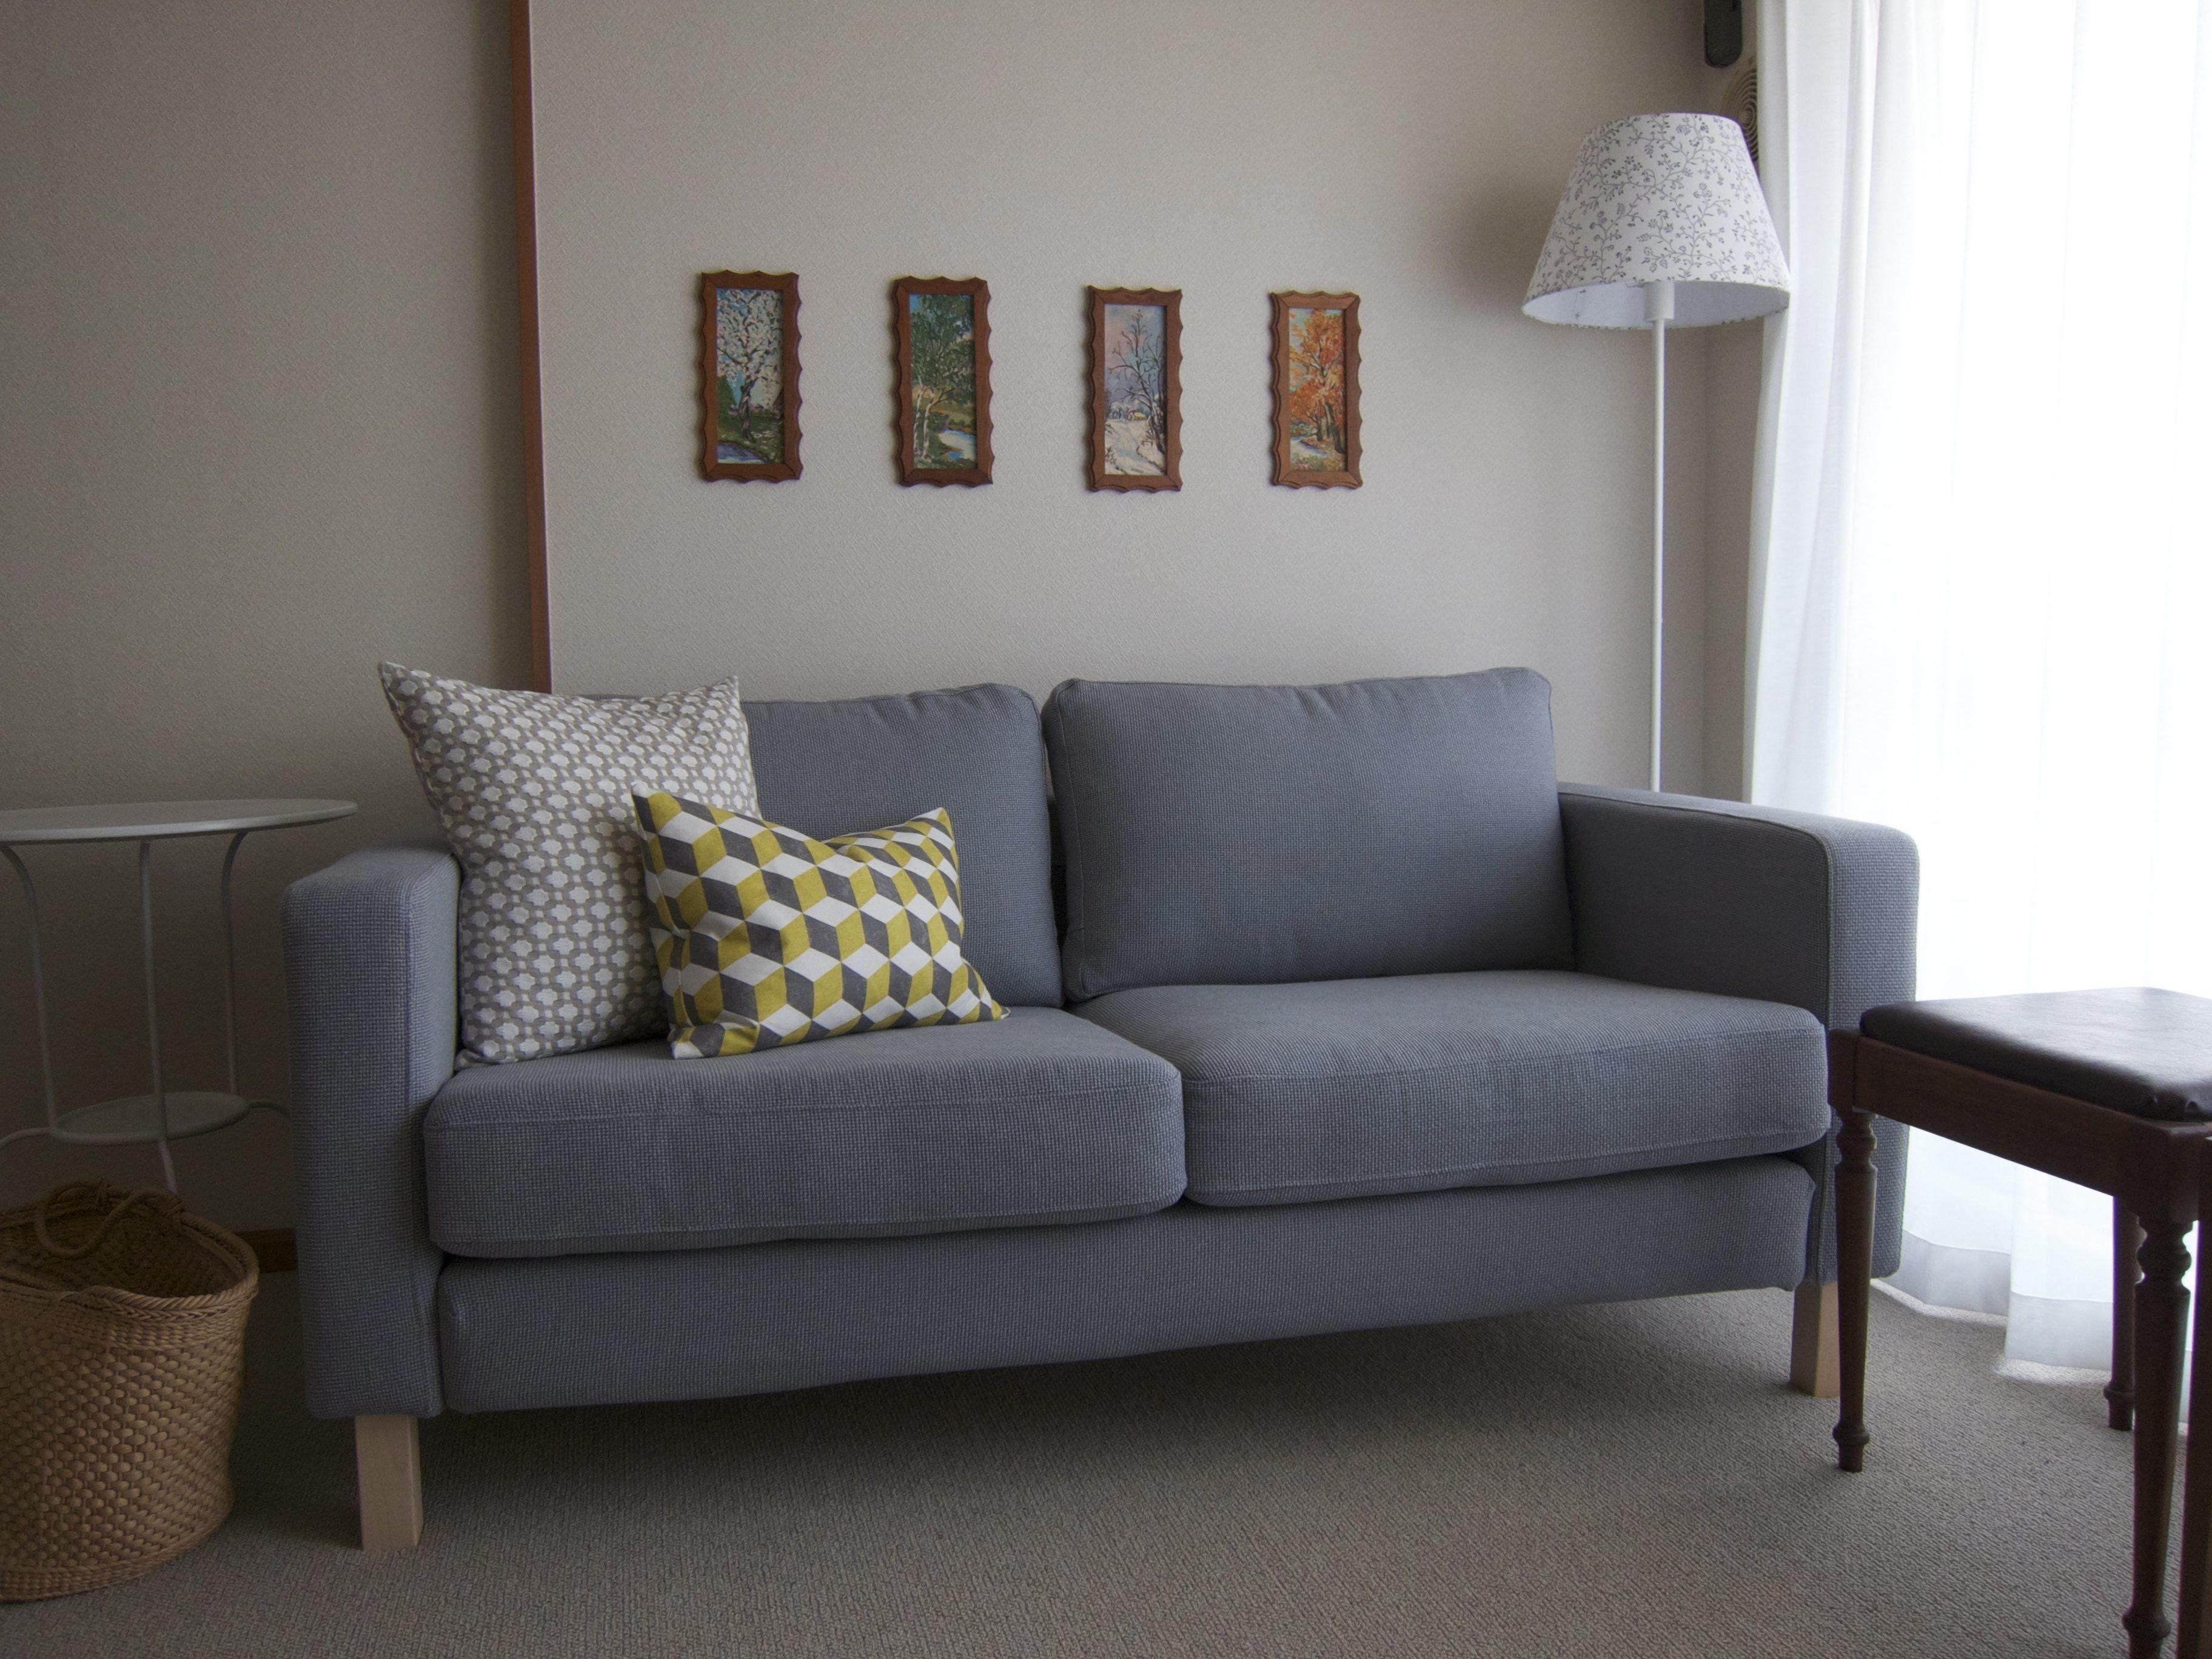 Explore Sofa Beds 3 4 Bedore Ikea Karlstad